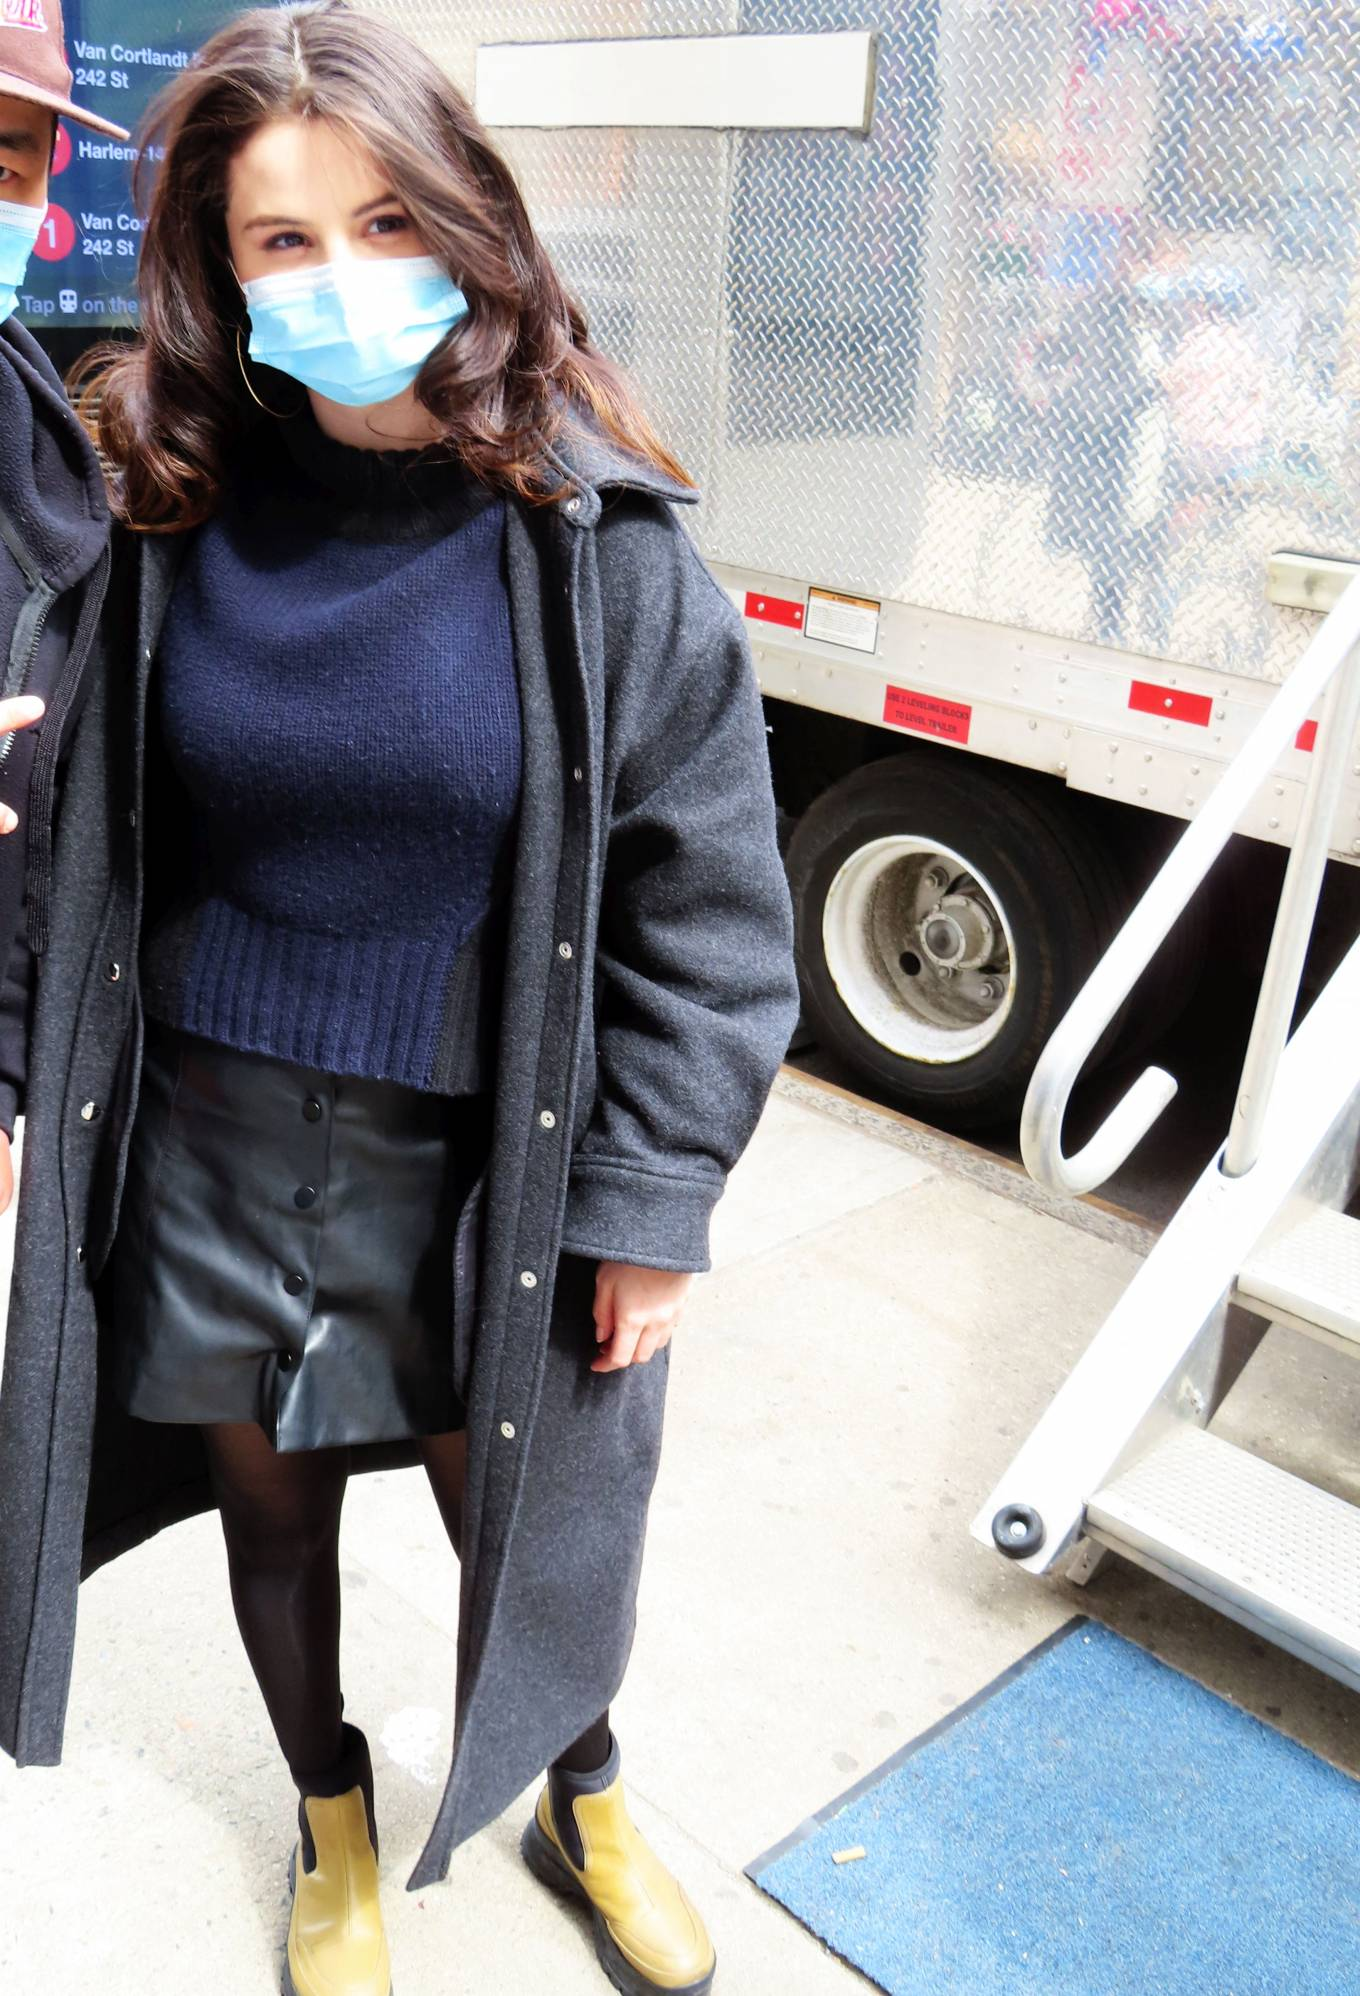 Selena Gomez, leather, black mini skirt, beige Stella McCartney boots, oversized black IRO jacket, fitted, front button, mini, navy blue sweater, black leggings. Selena Gomez rocking a black fitted leather mini skirt